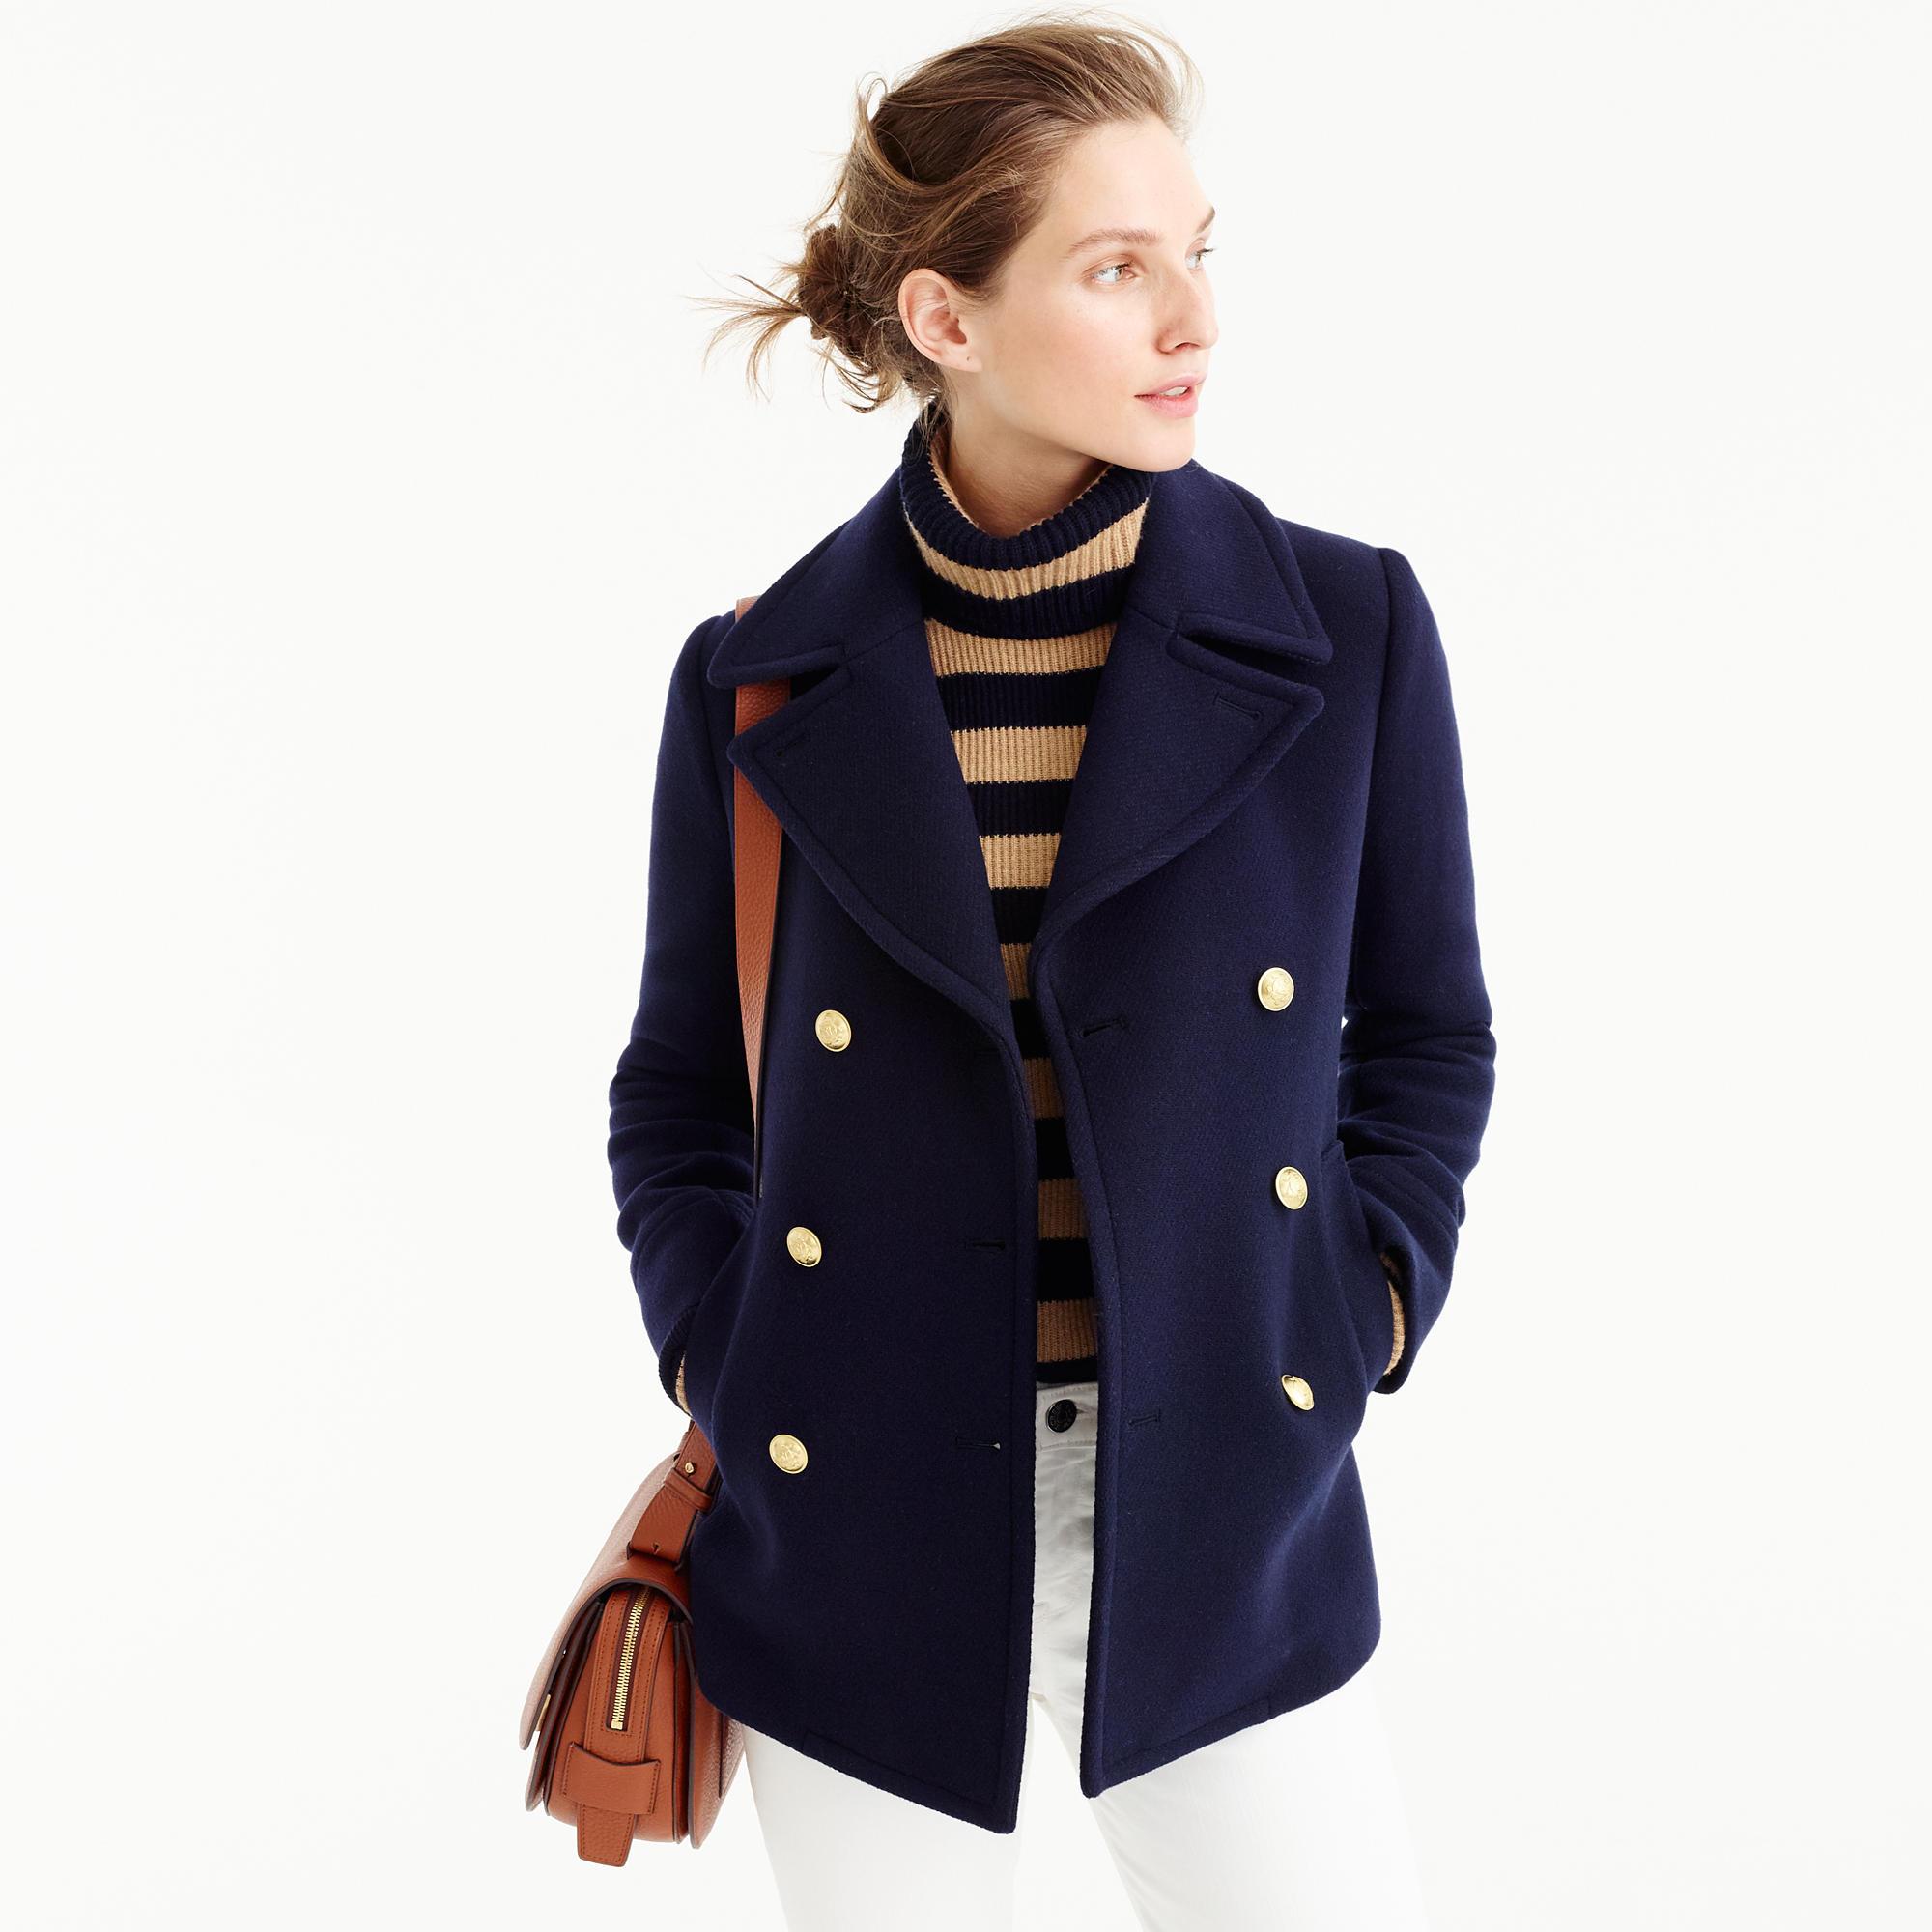 Petite Majesty Peacoat : Women&39s Coats &amp Jackets | J.Crew